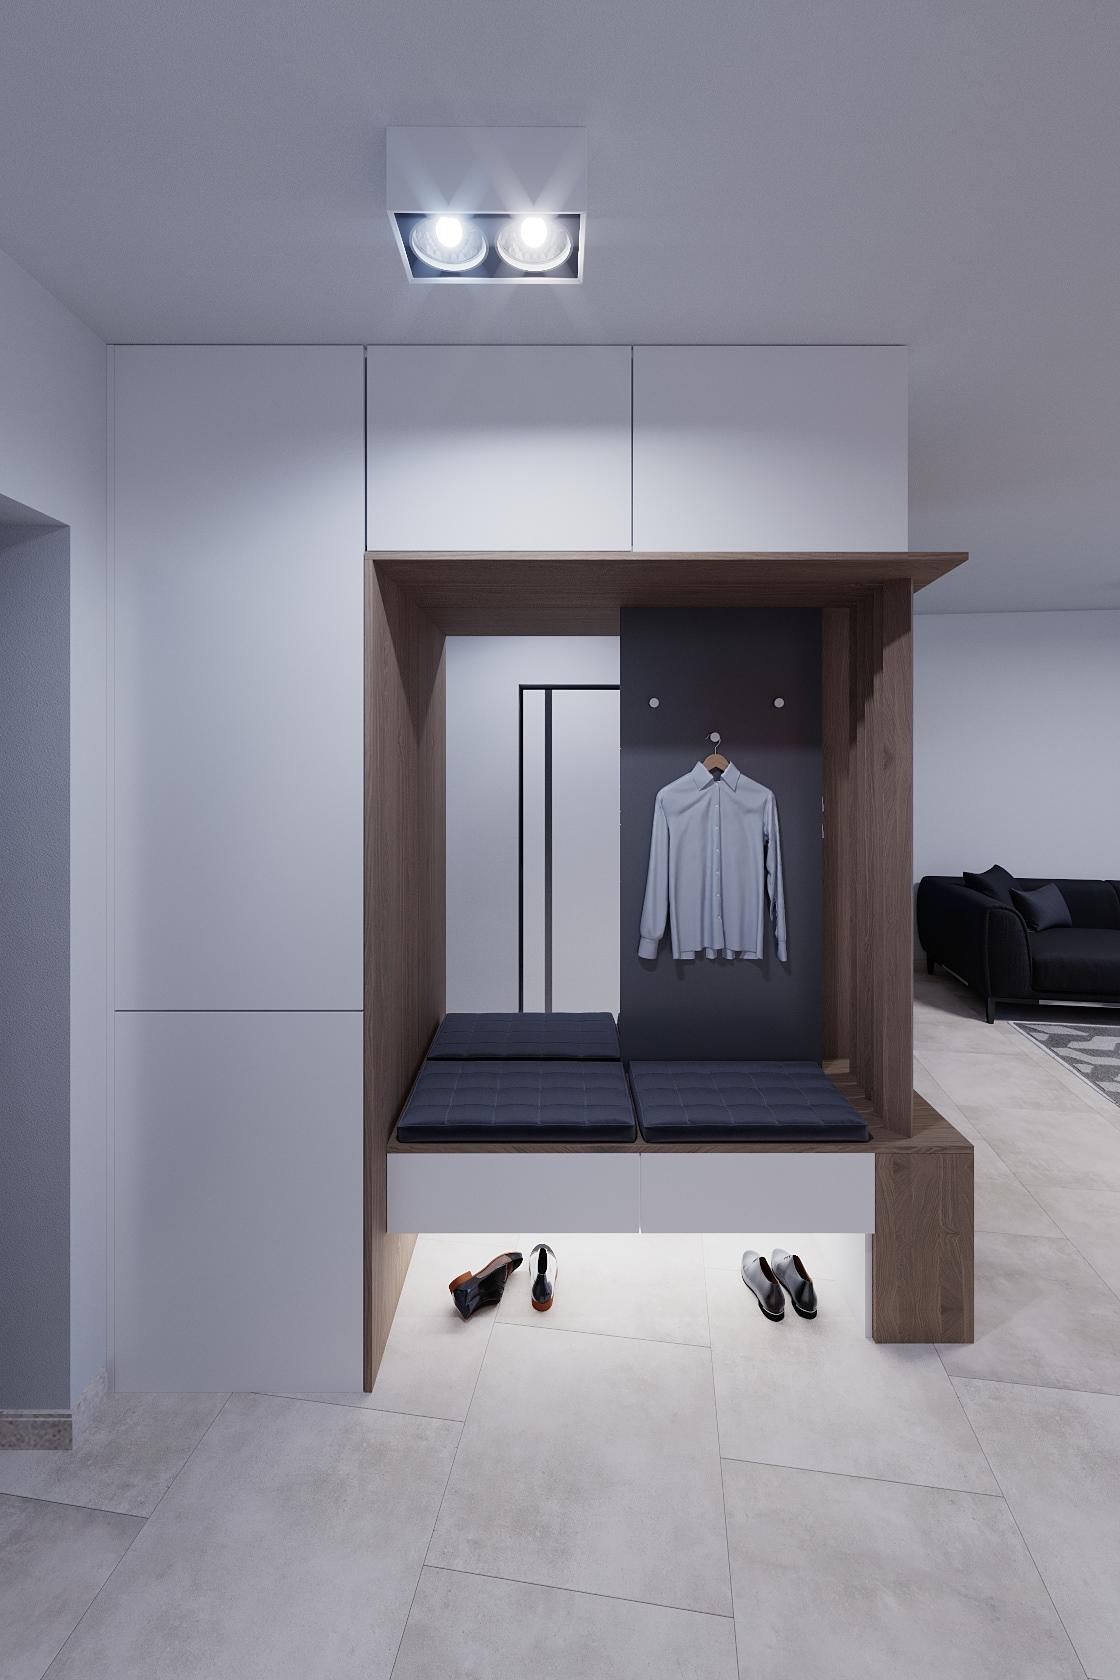 corona CoronaRender  house flat Interior city living revit wood